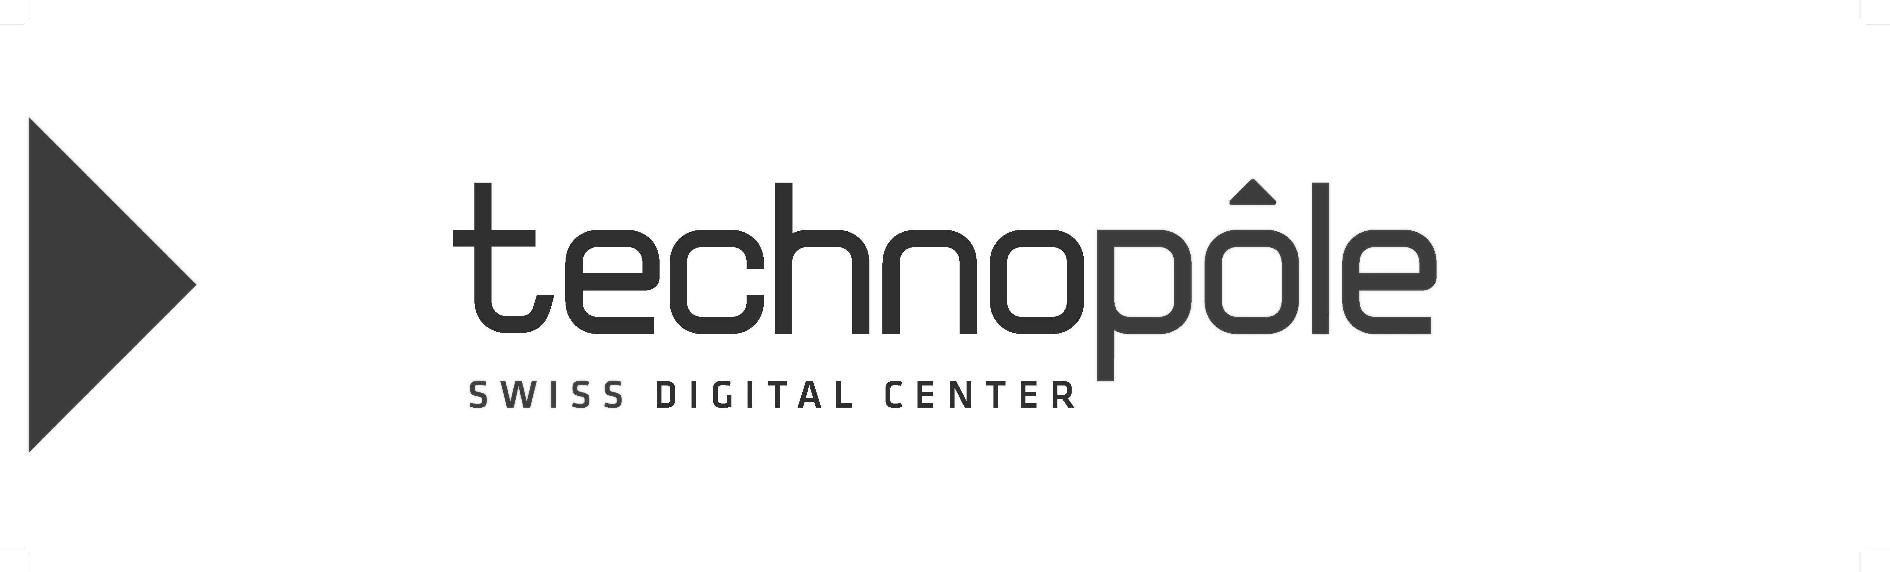 Technopôle Swiss Digital Center